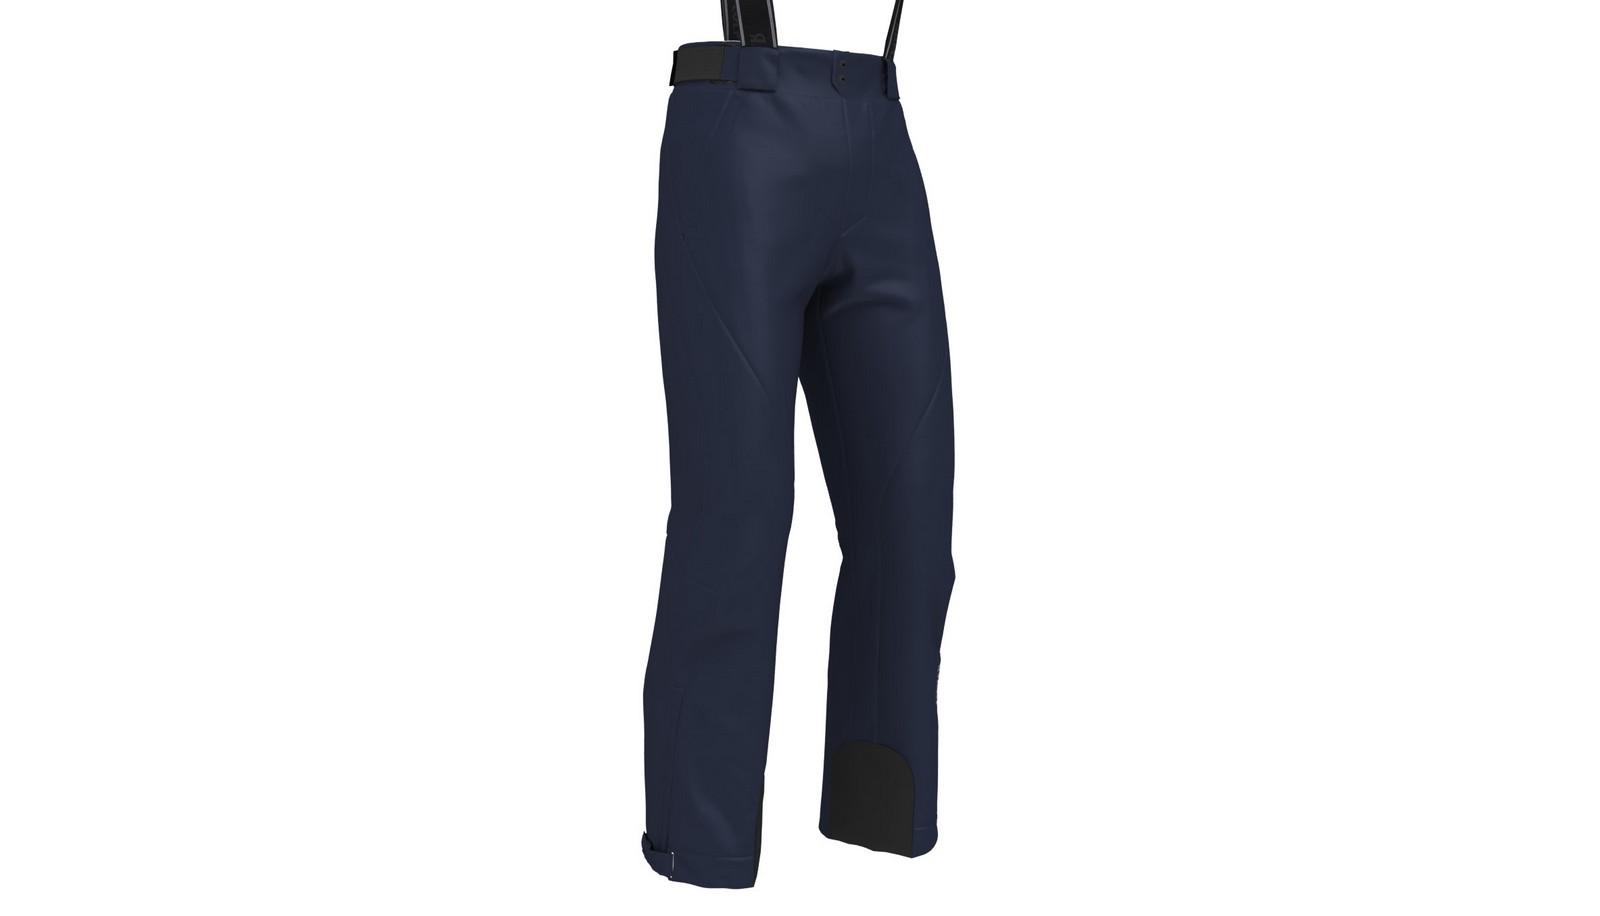 Colmar MENS INSULATED PANTS, muške skijaške hlače, plava